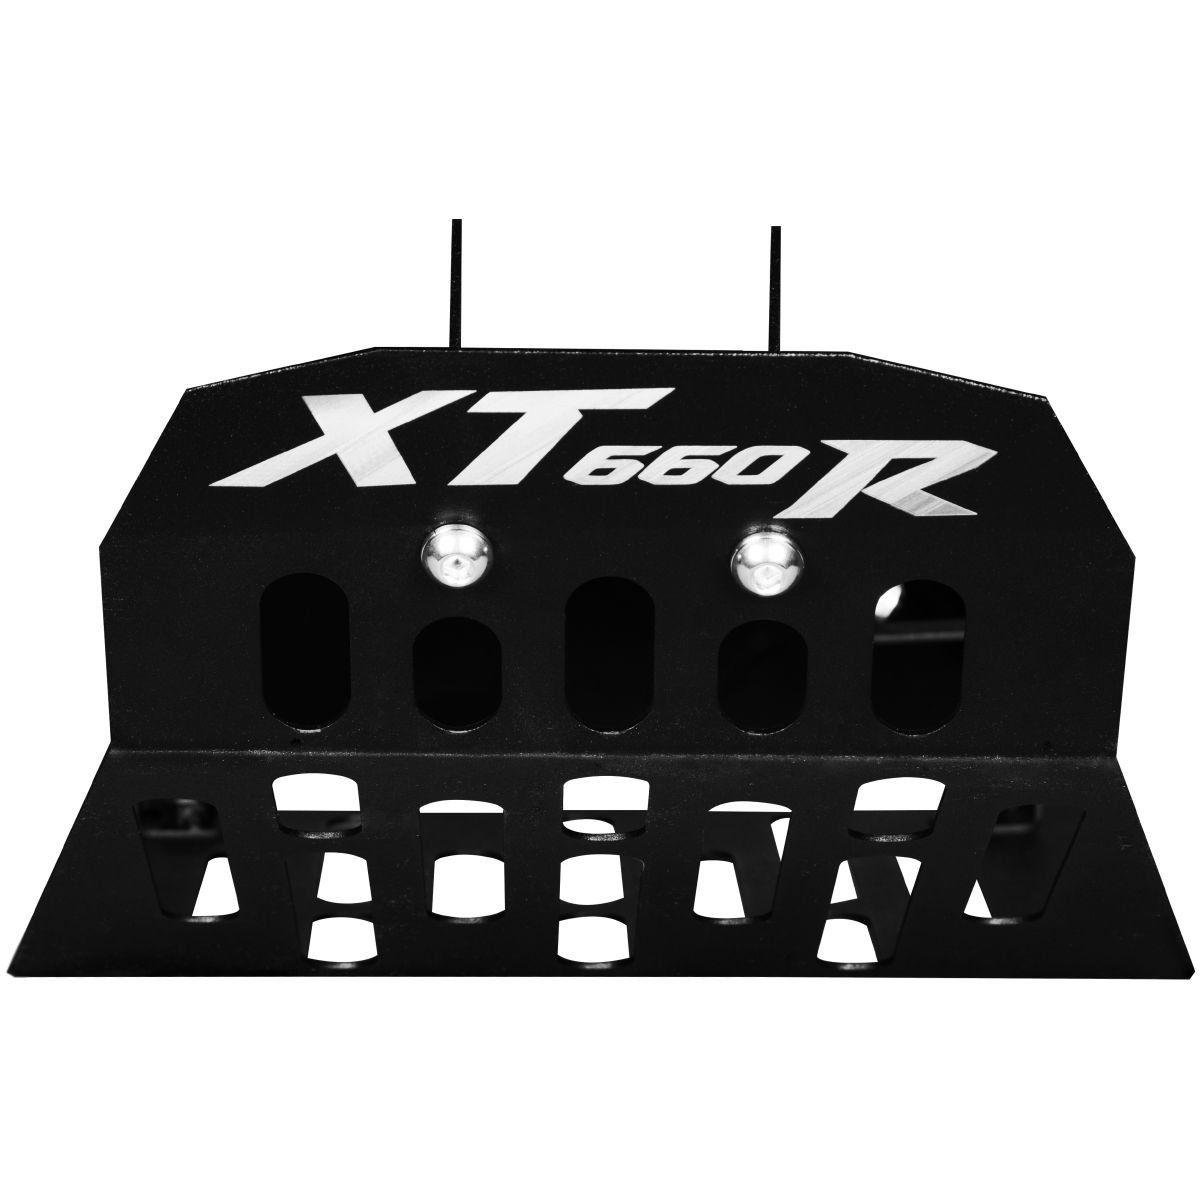 Protetor Cárter Motor Xt 660 2012 2013 2014 2015 2016 2017 2018 2019